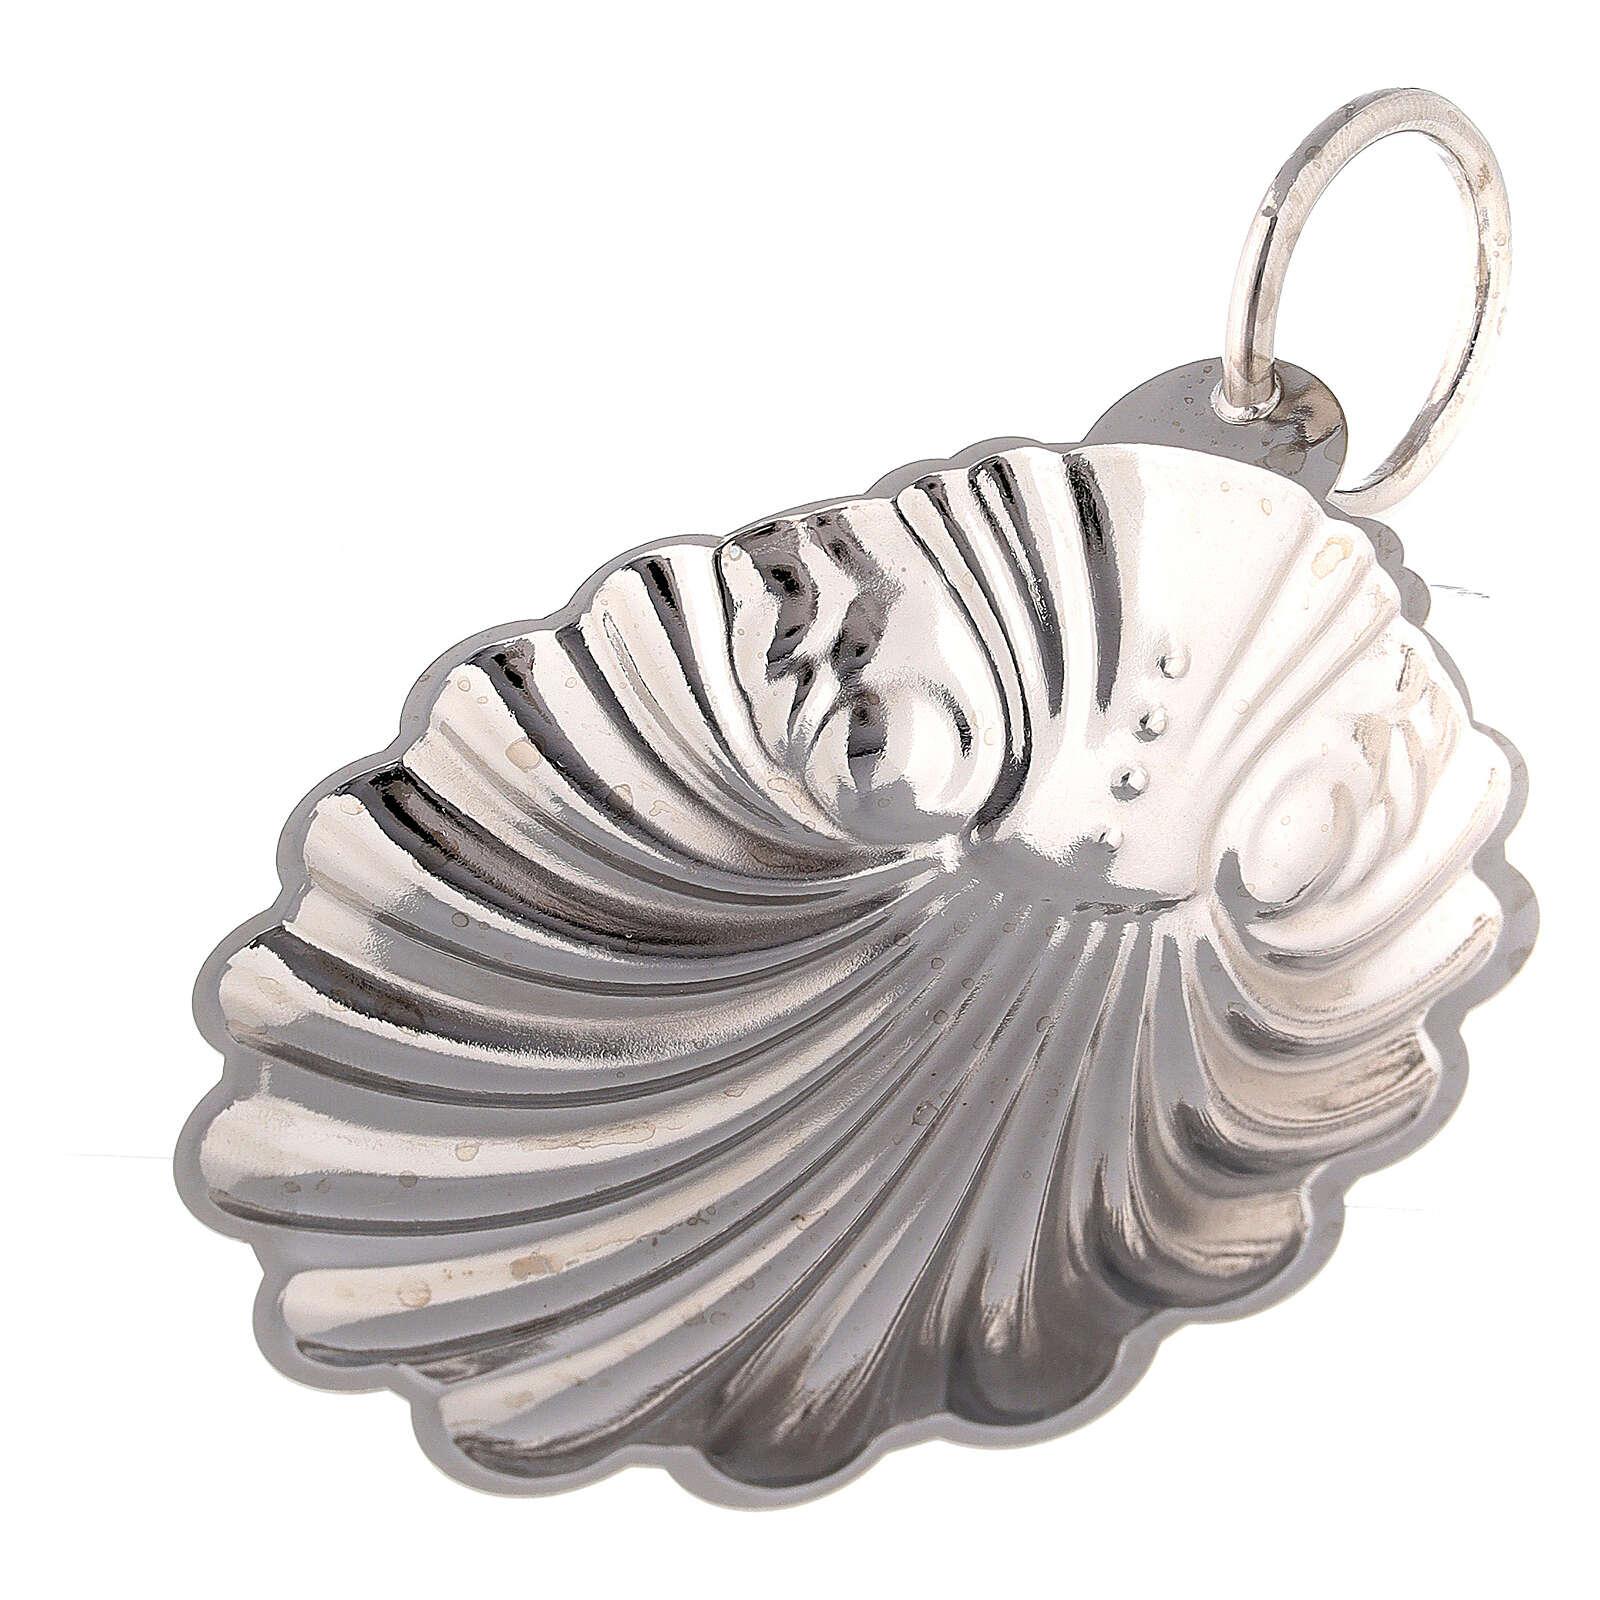 Silver plated brass baptismal shell 9 cm 3